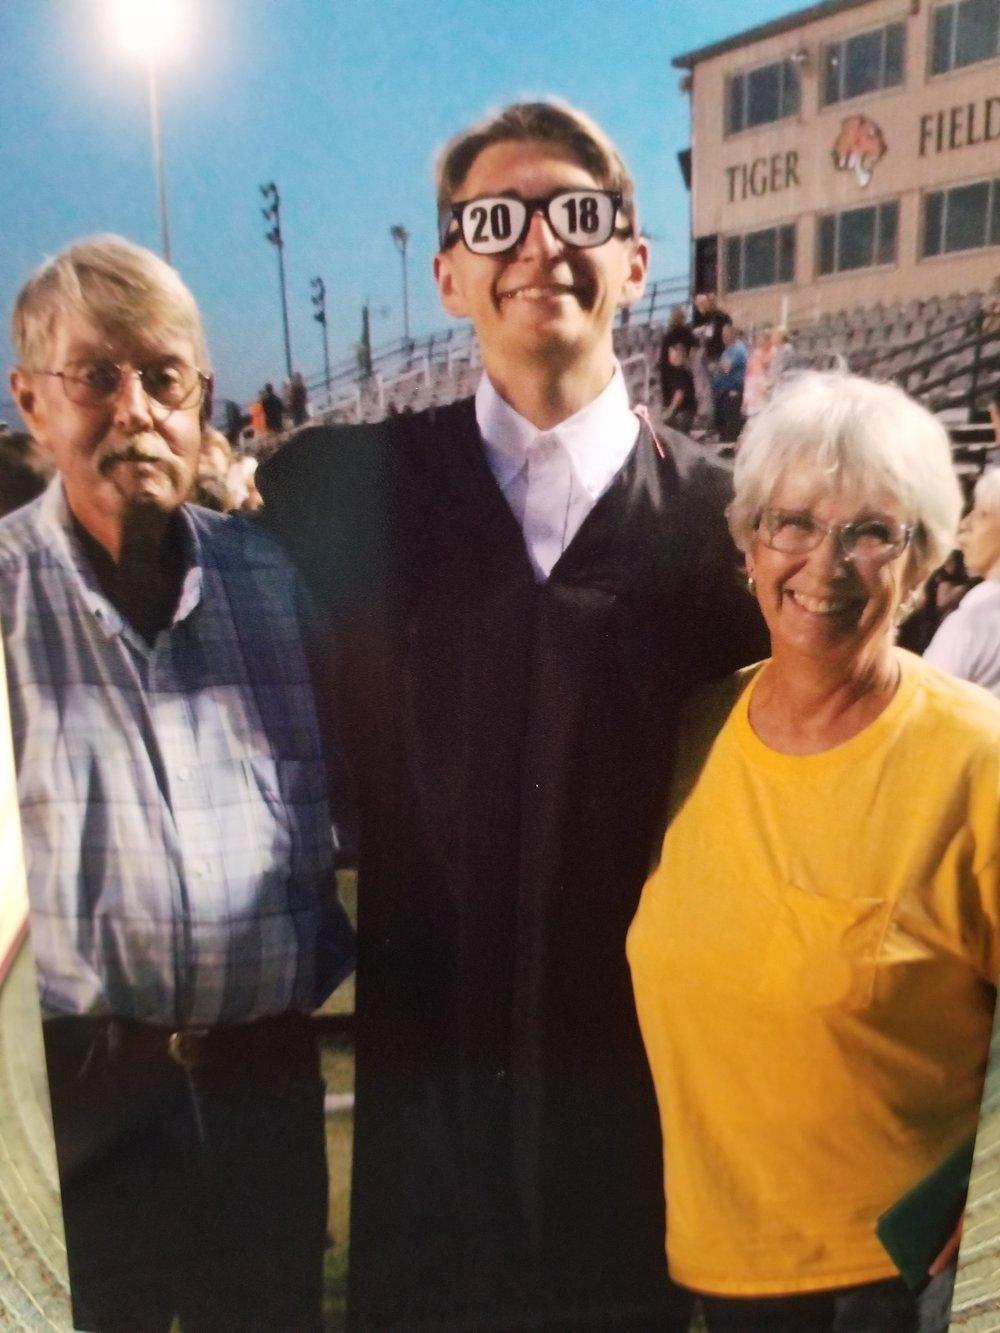 Gayle Grad Grandson 20180523_160710.jpg